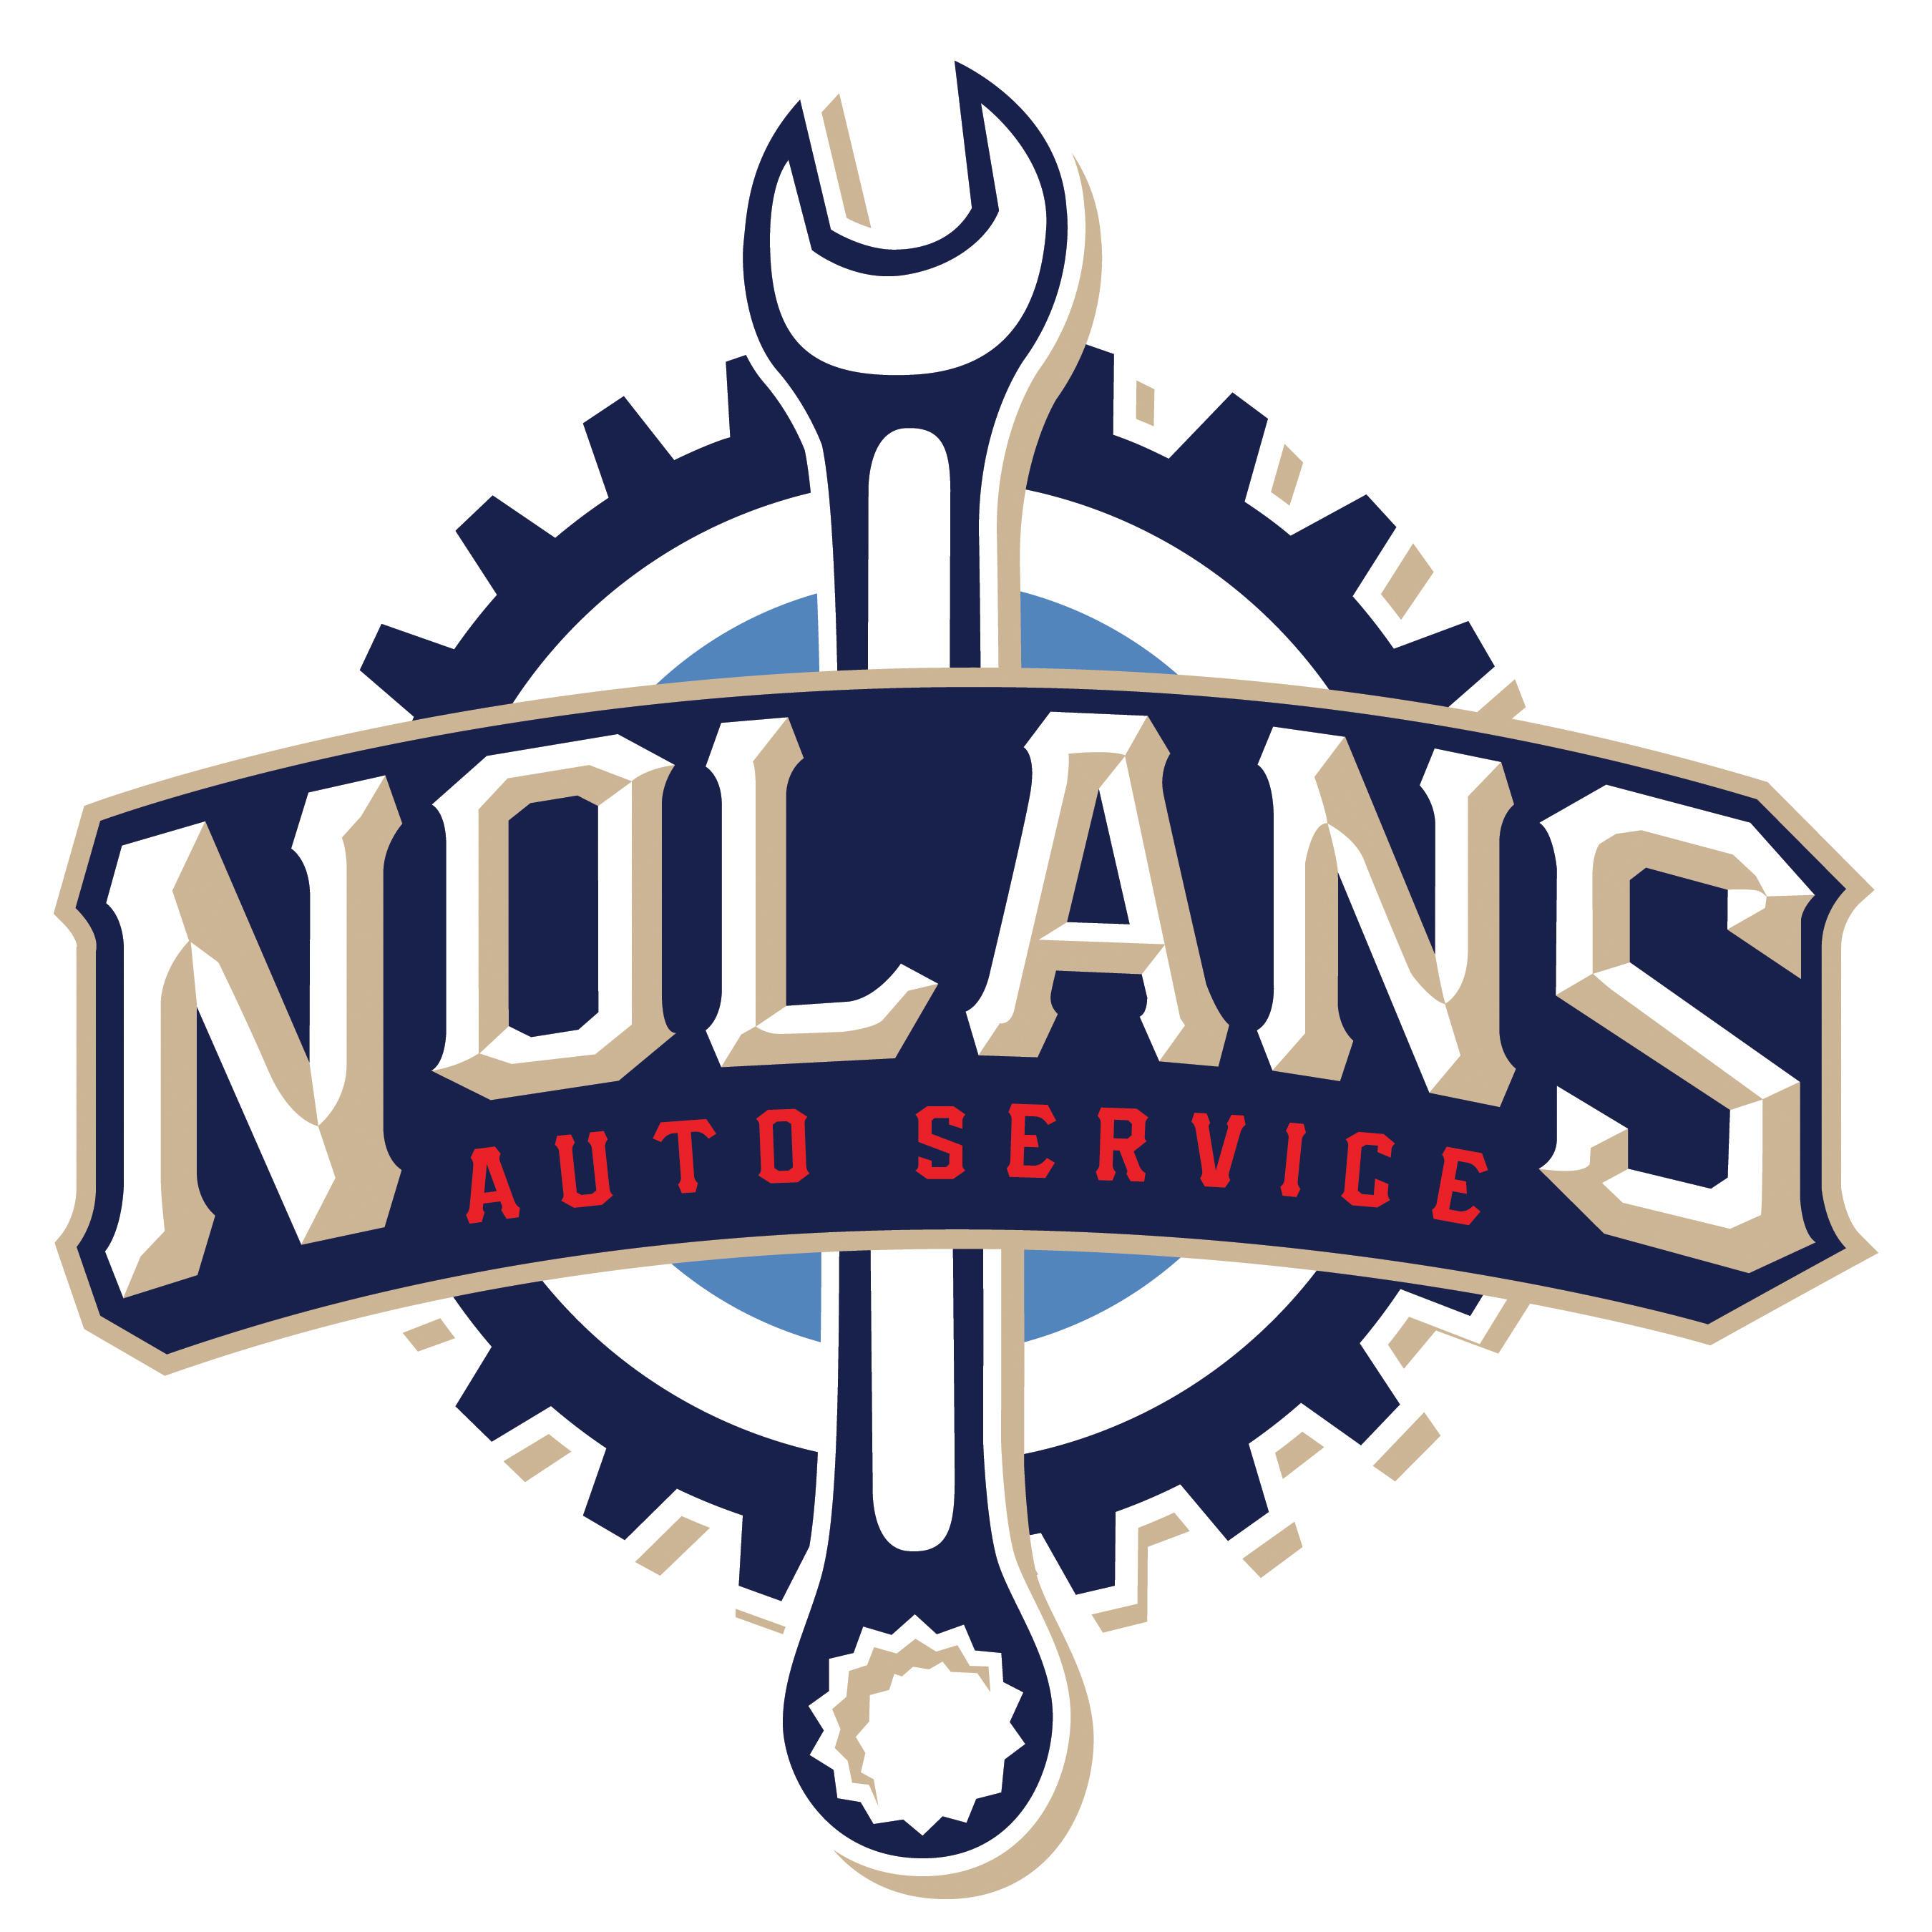 Nolan's Auto Services - Fullerton, CA - General Auto Repair & Service